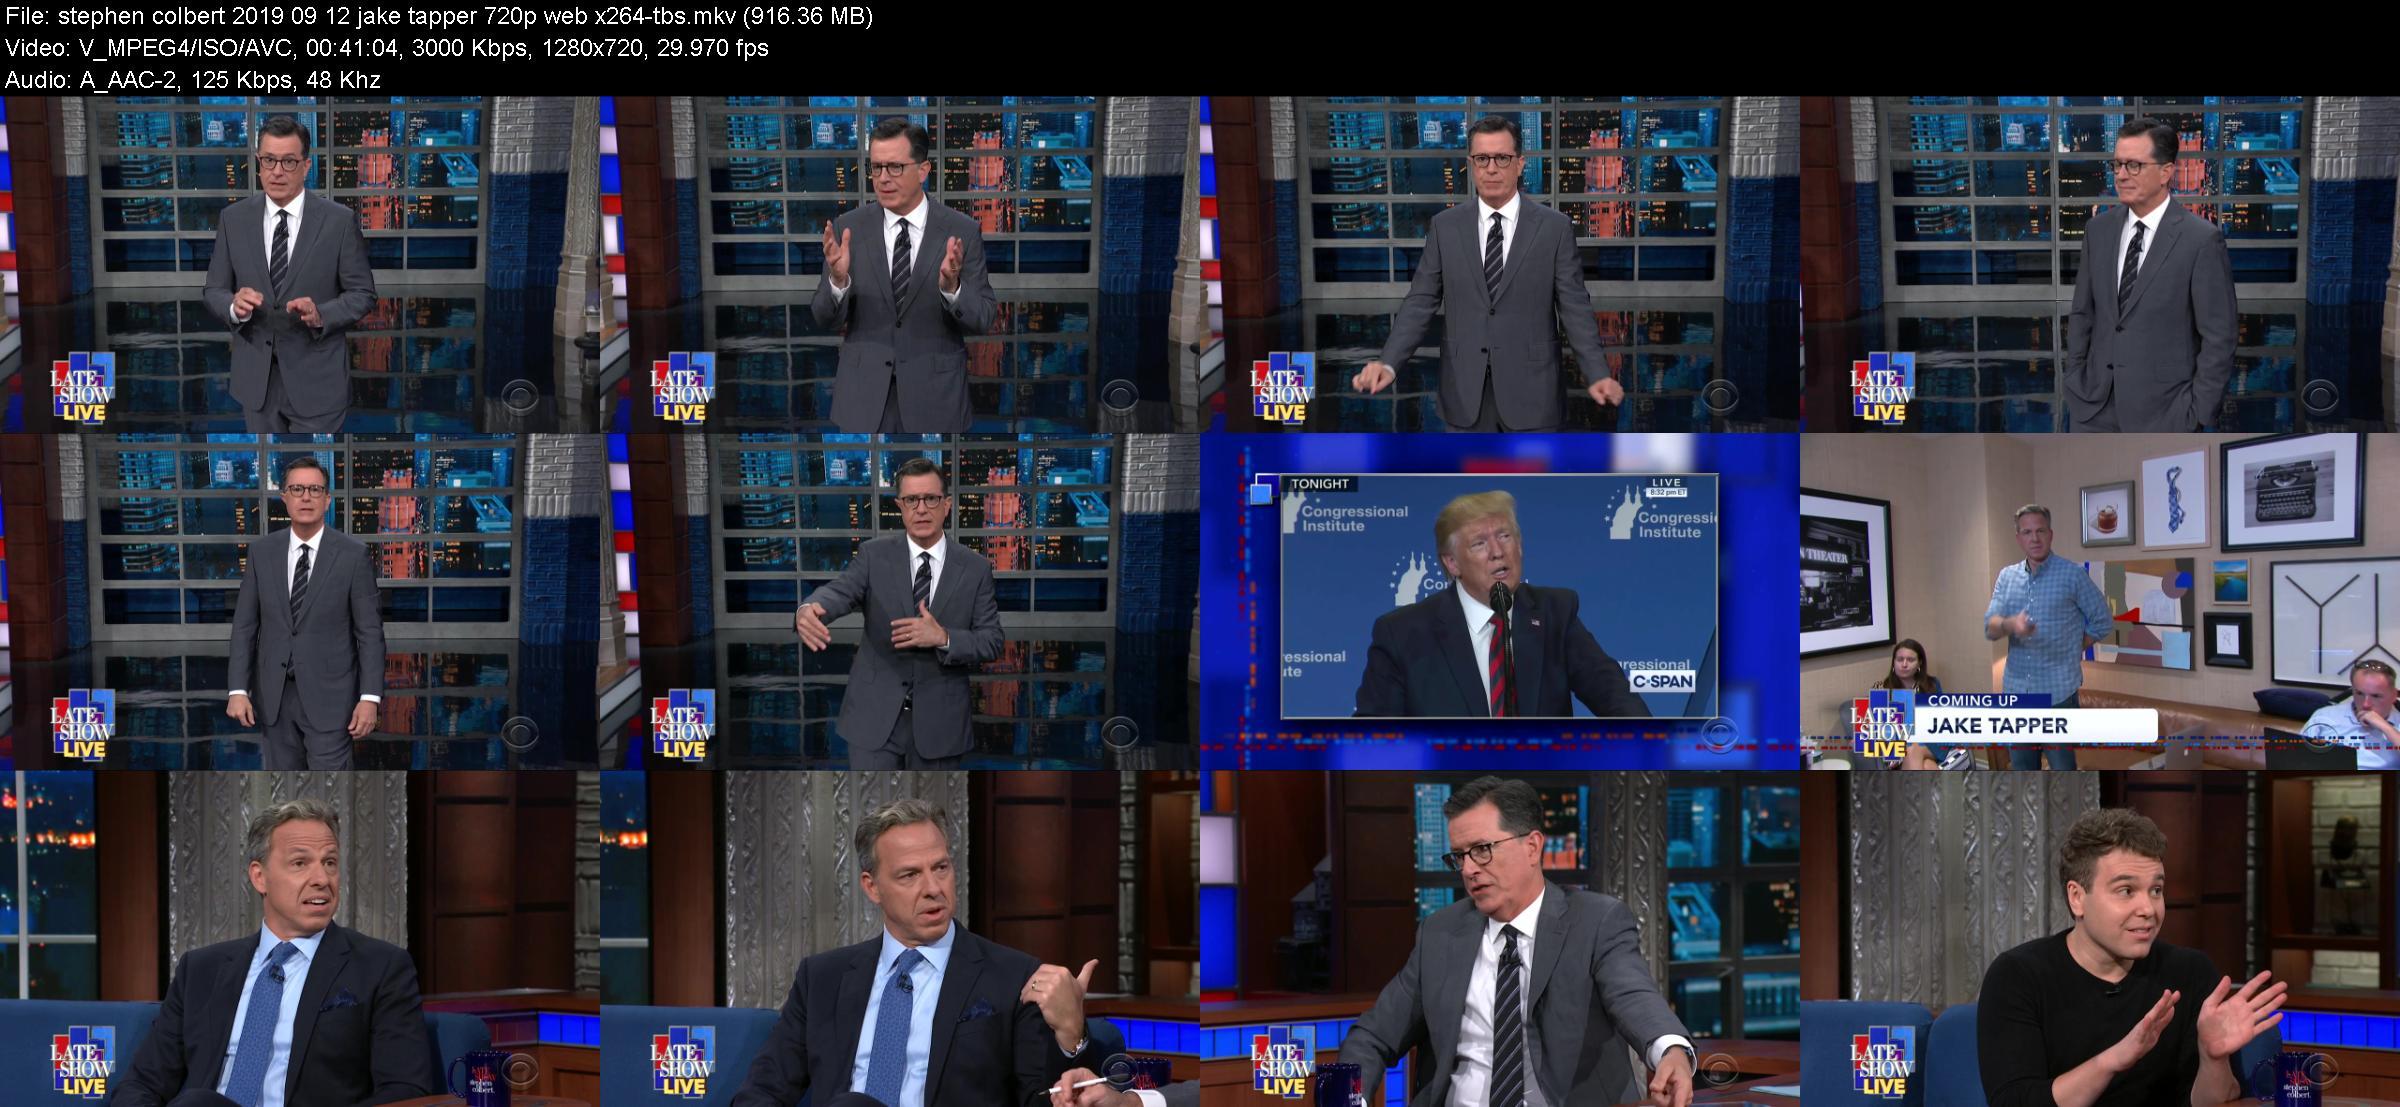 Stephen Colbert 2019 09 12 Jake Tapper 720p WEB x264-TBS